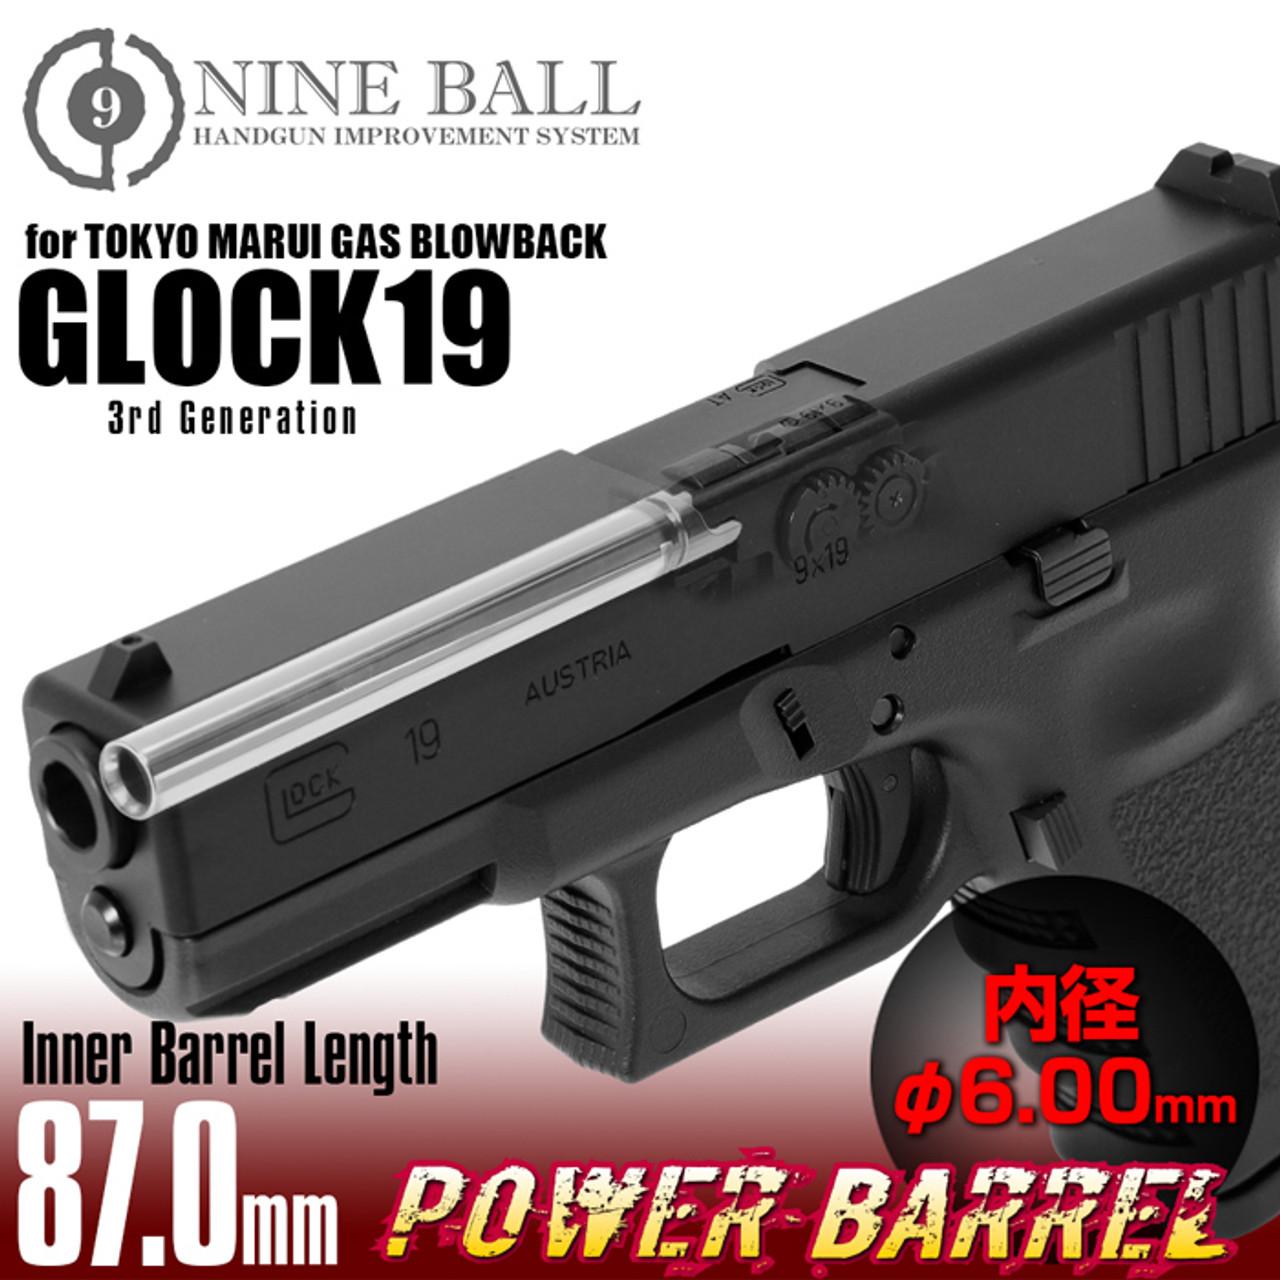 Nineball TM G19 Power Barrel 87mm